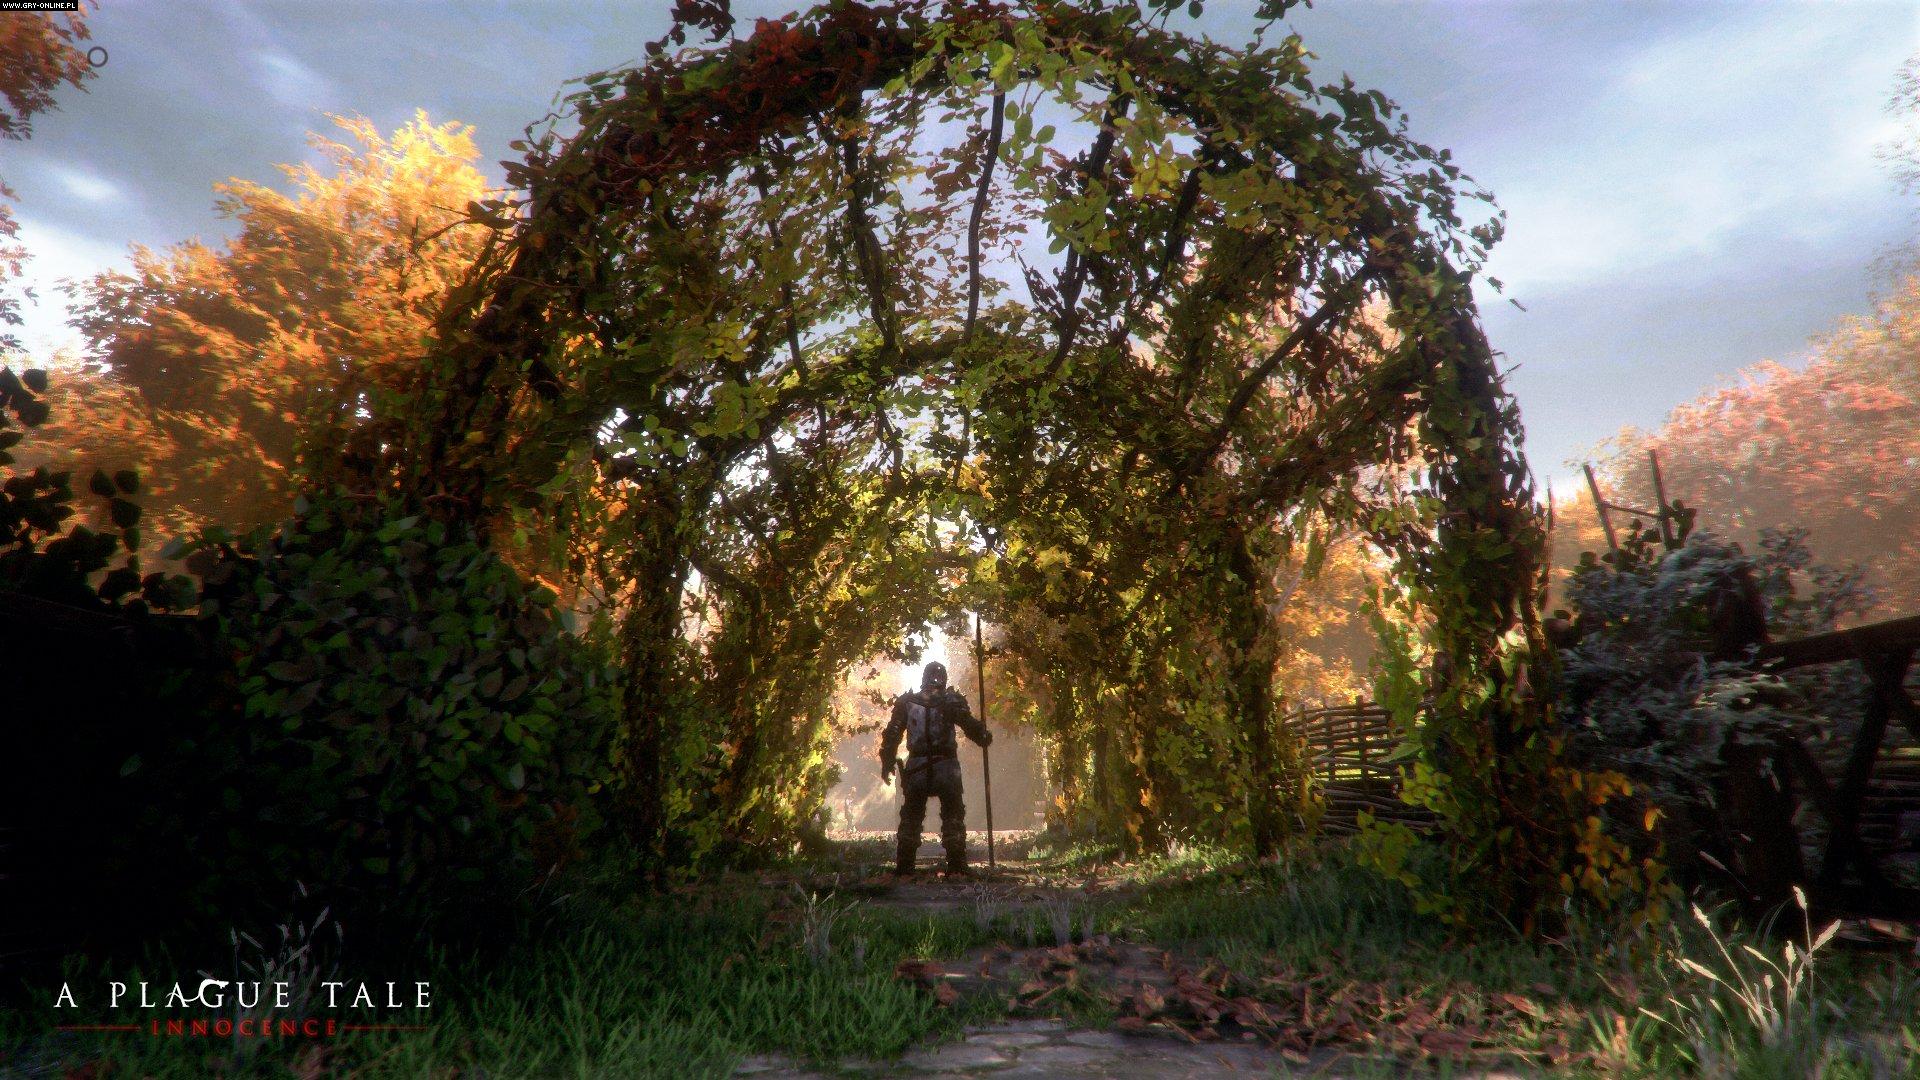 A Plague Tale: Innocence PC, PS4, XONE Games Image 16/30, Asobo Studio, Focus Home Interactive